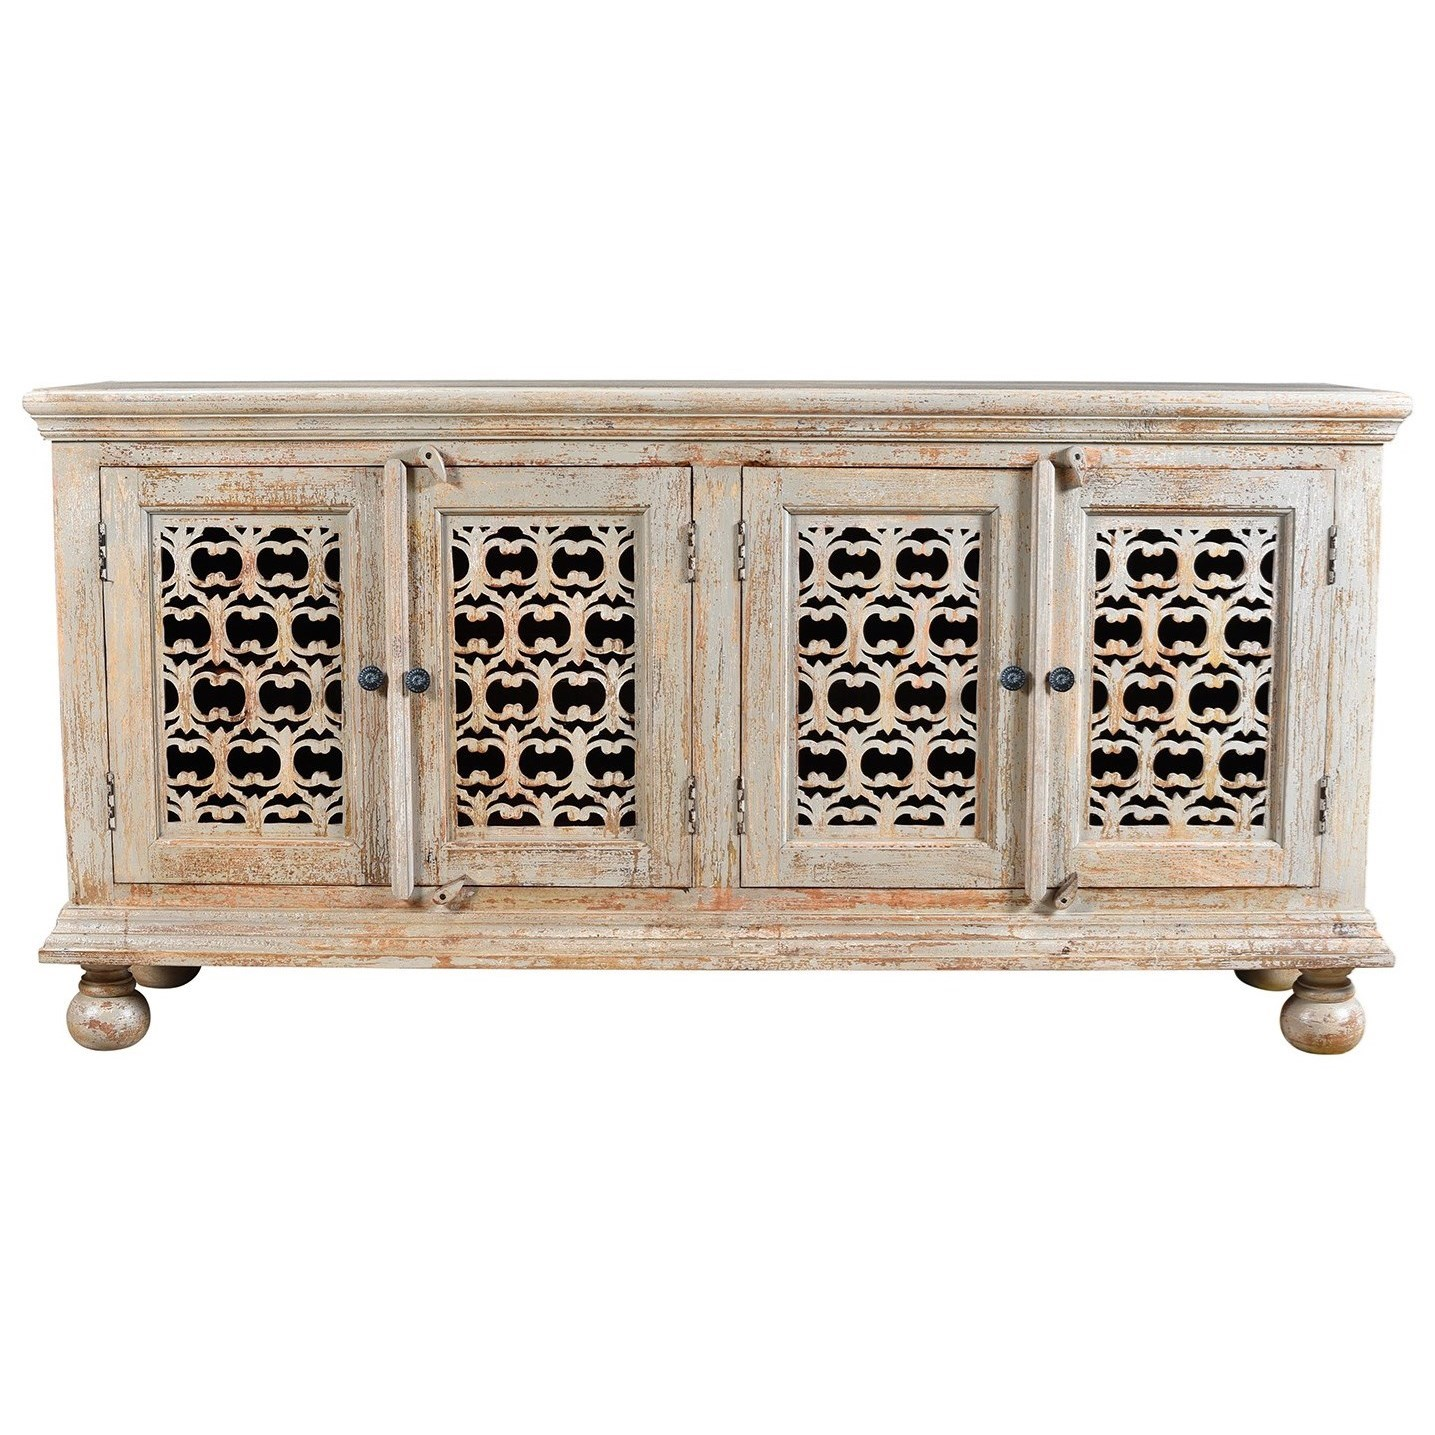 Bengal Manor Mango Wood Aged Ash 4 Door Carv